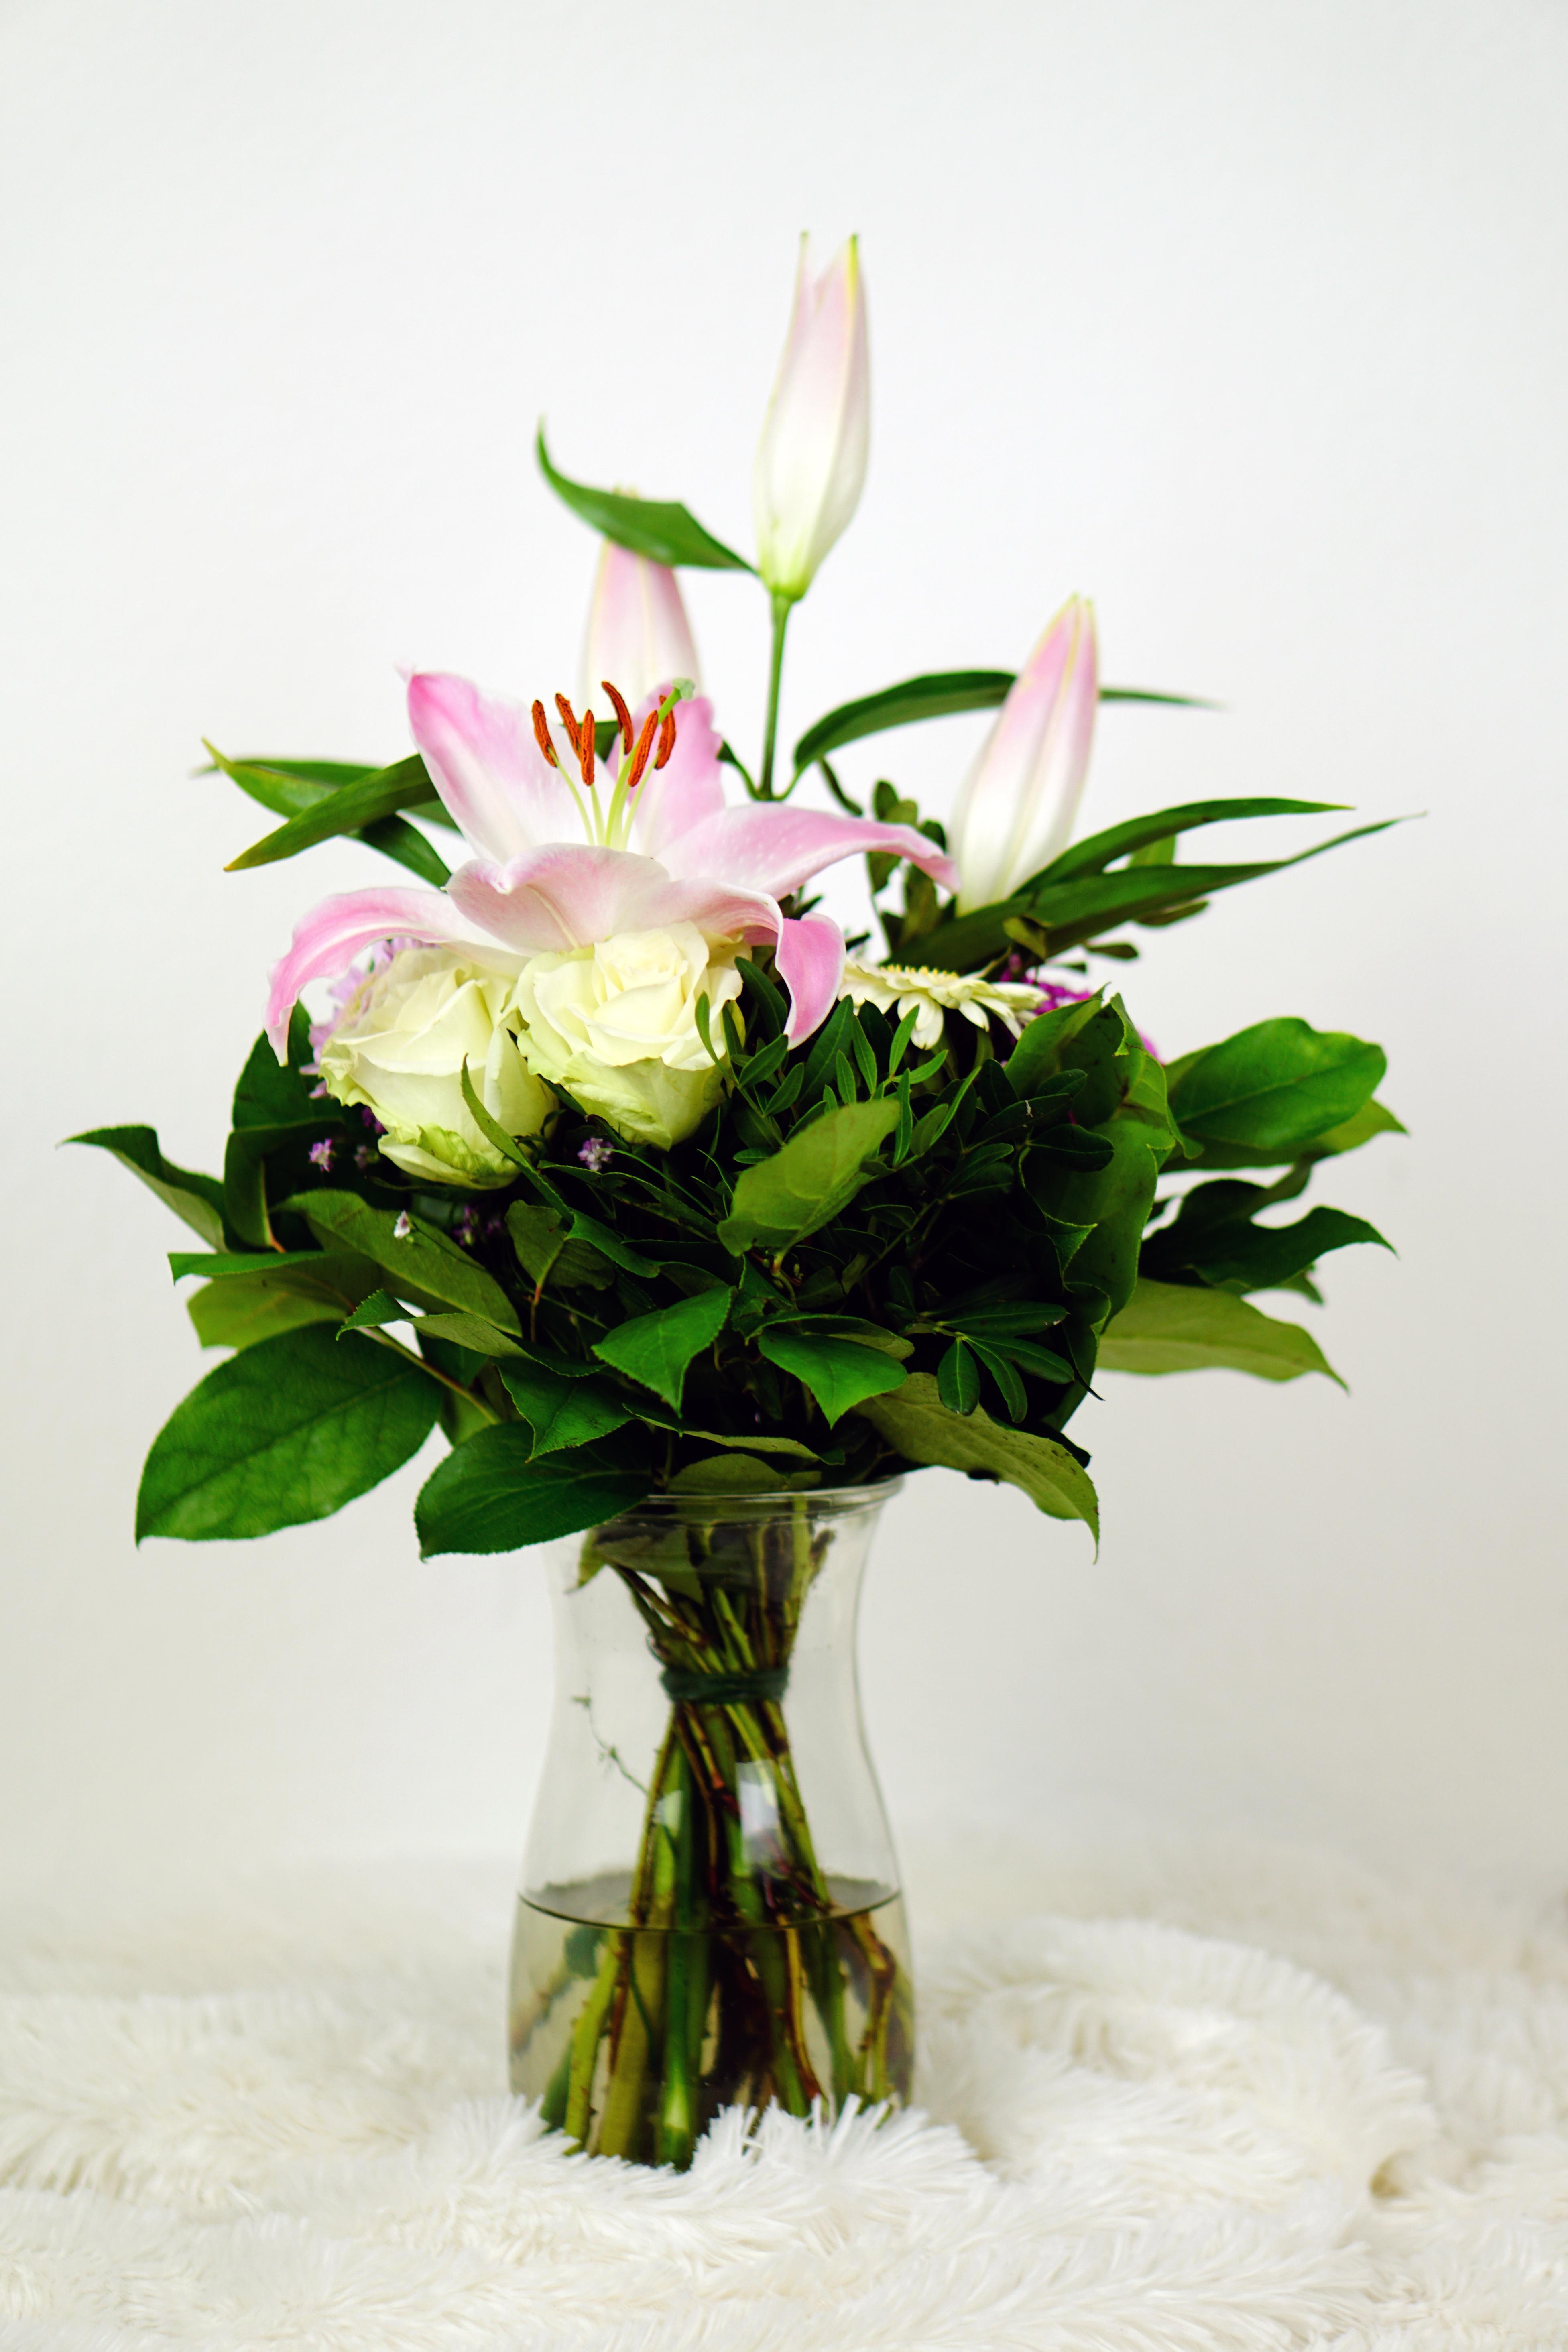 Free Images Nature Blossom Petal Bloom Celebration Love Gift